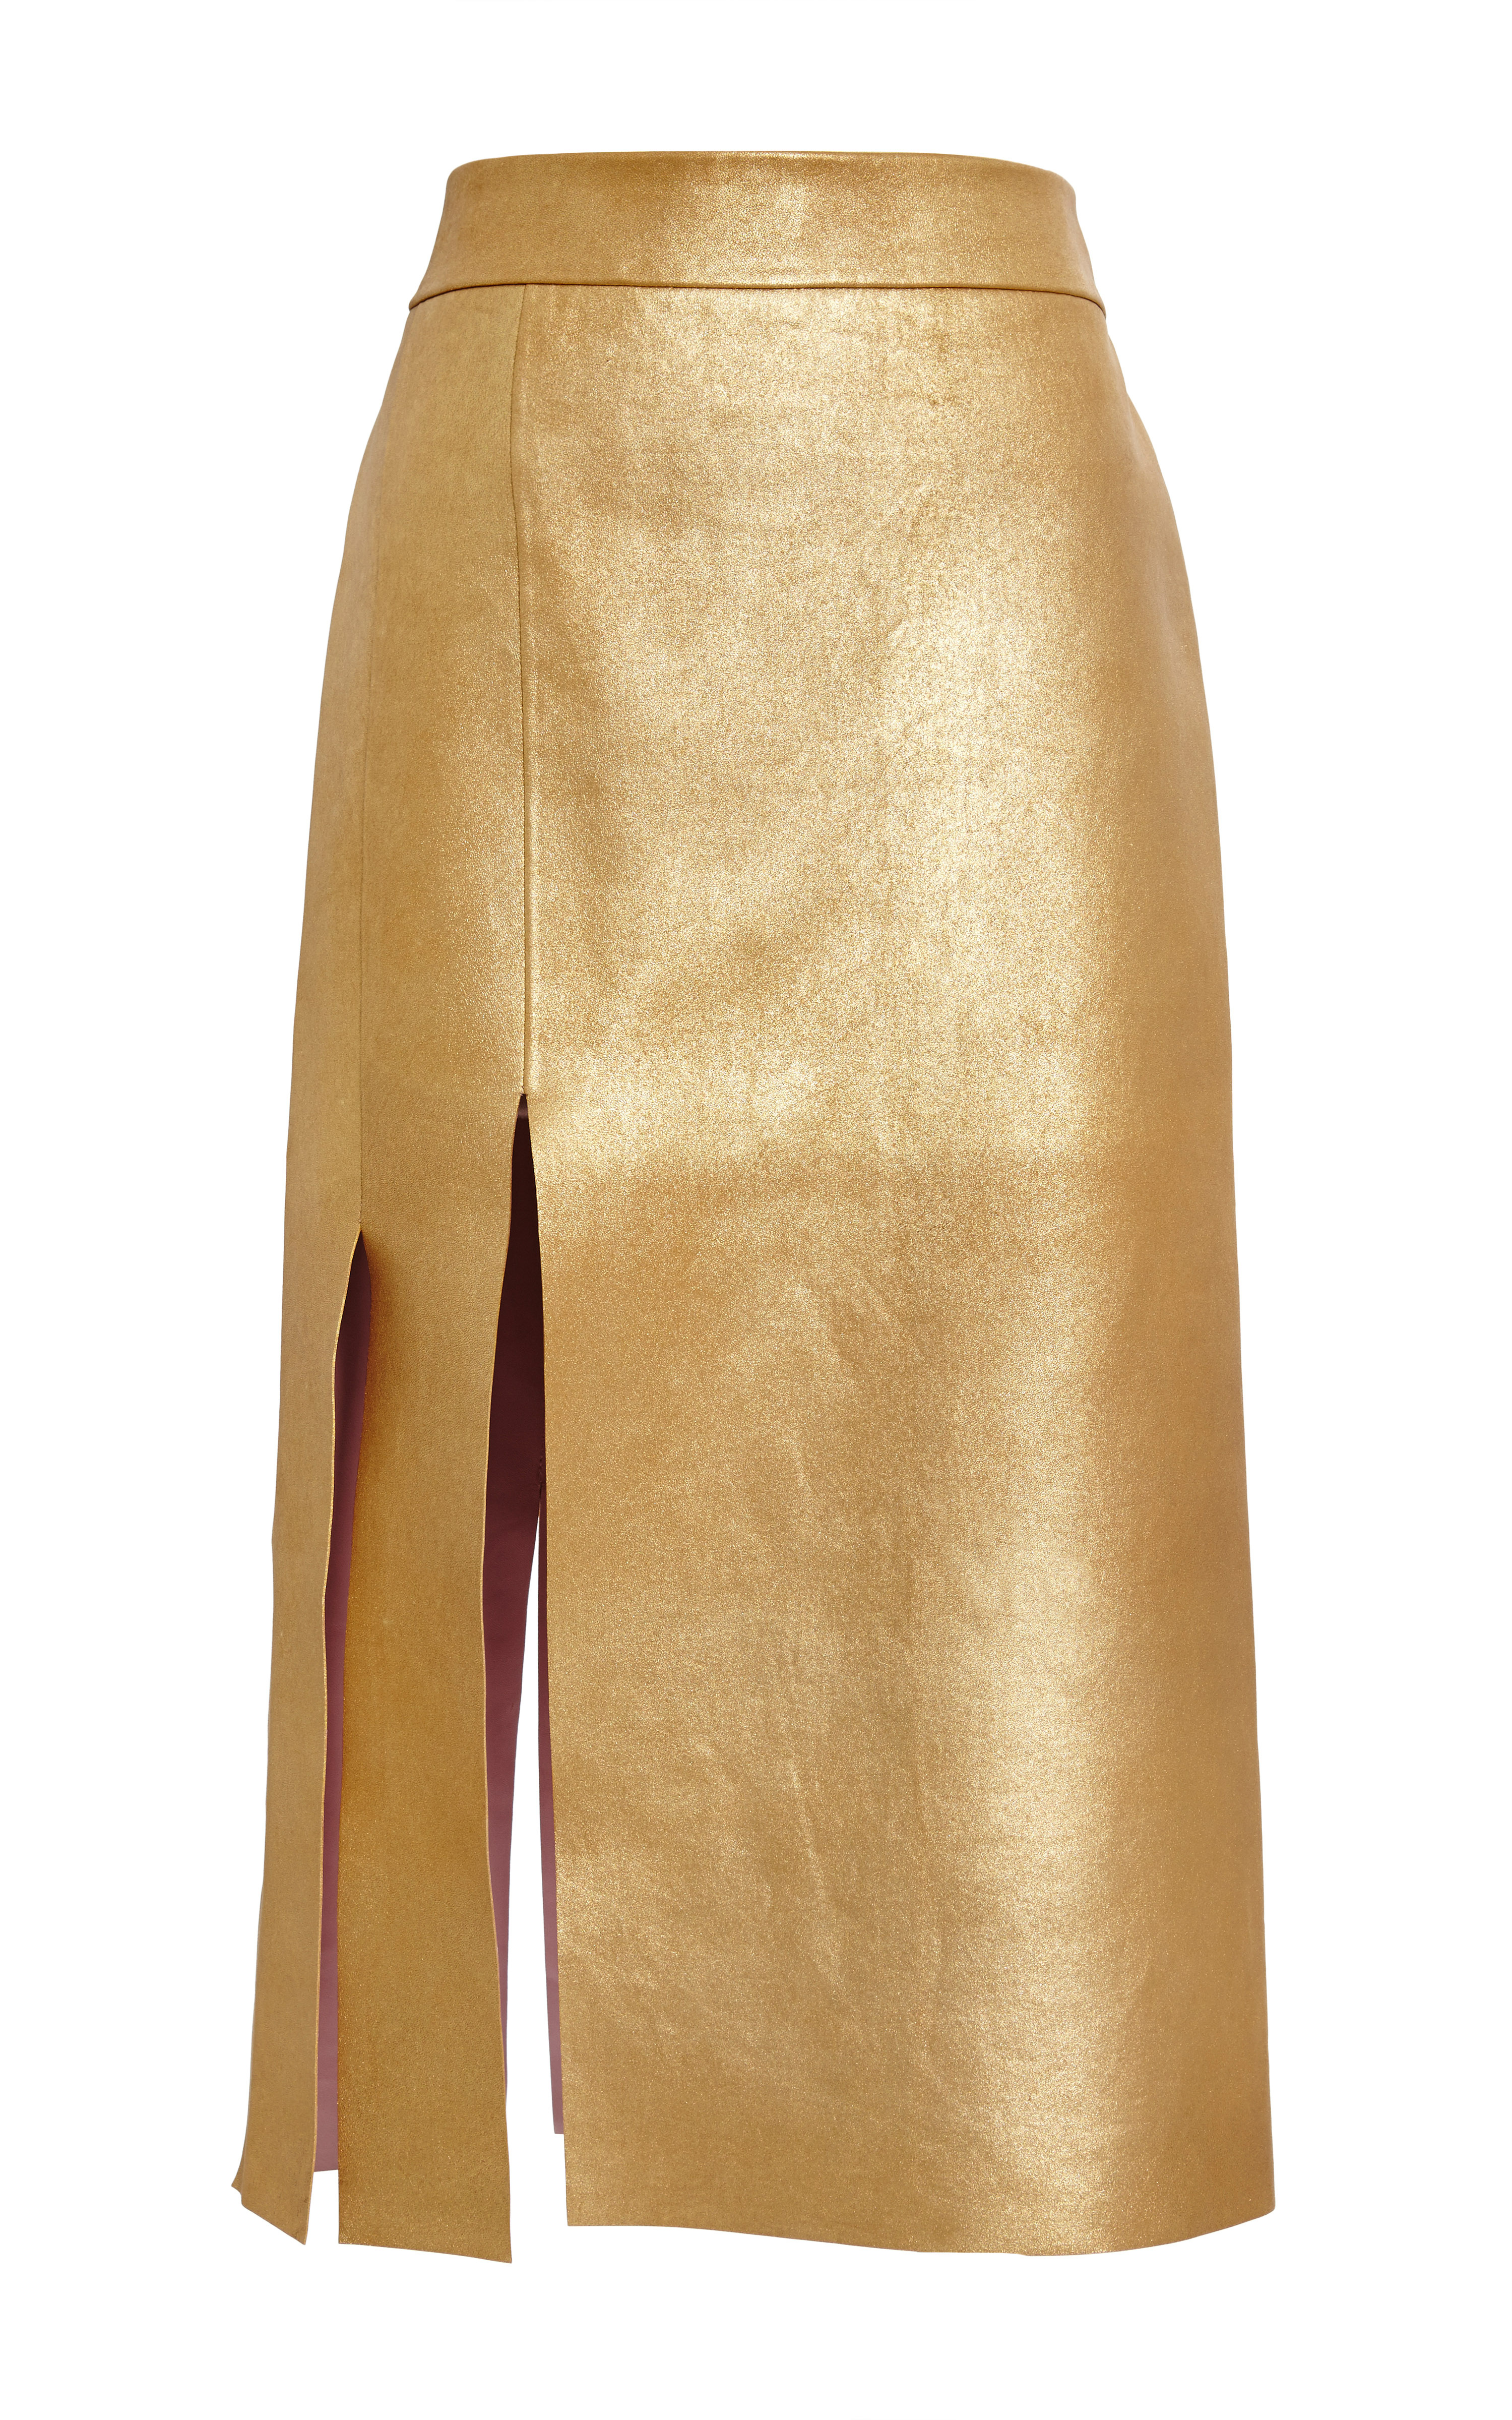 Nina ricci Gold Bonded Gold Leather Skirt in Metallic | Lyst